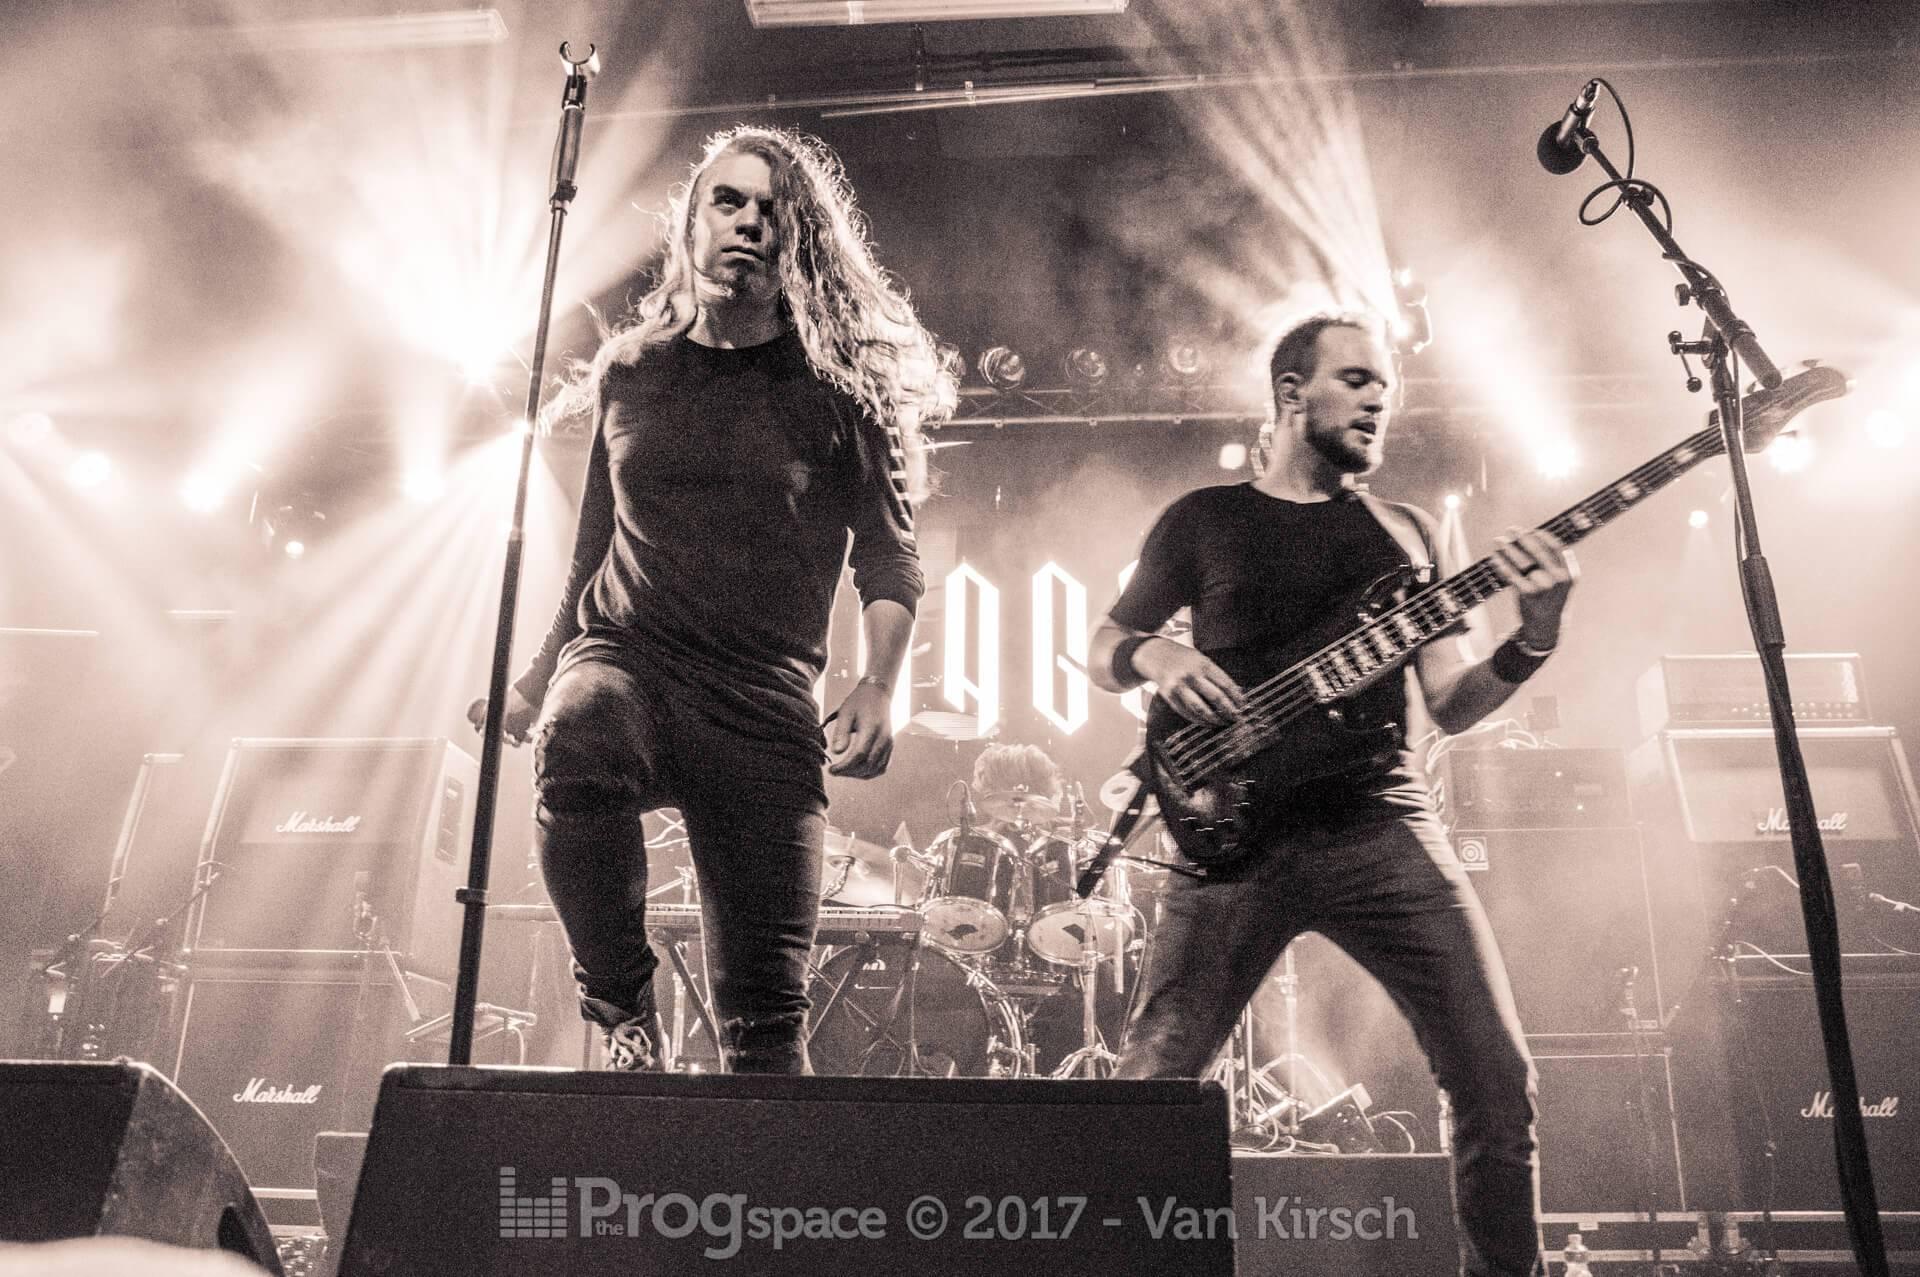 Voyager at ProgPower Europe 2017